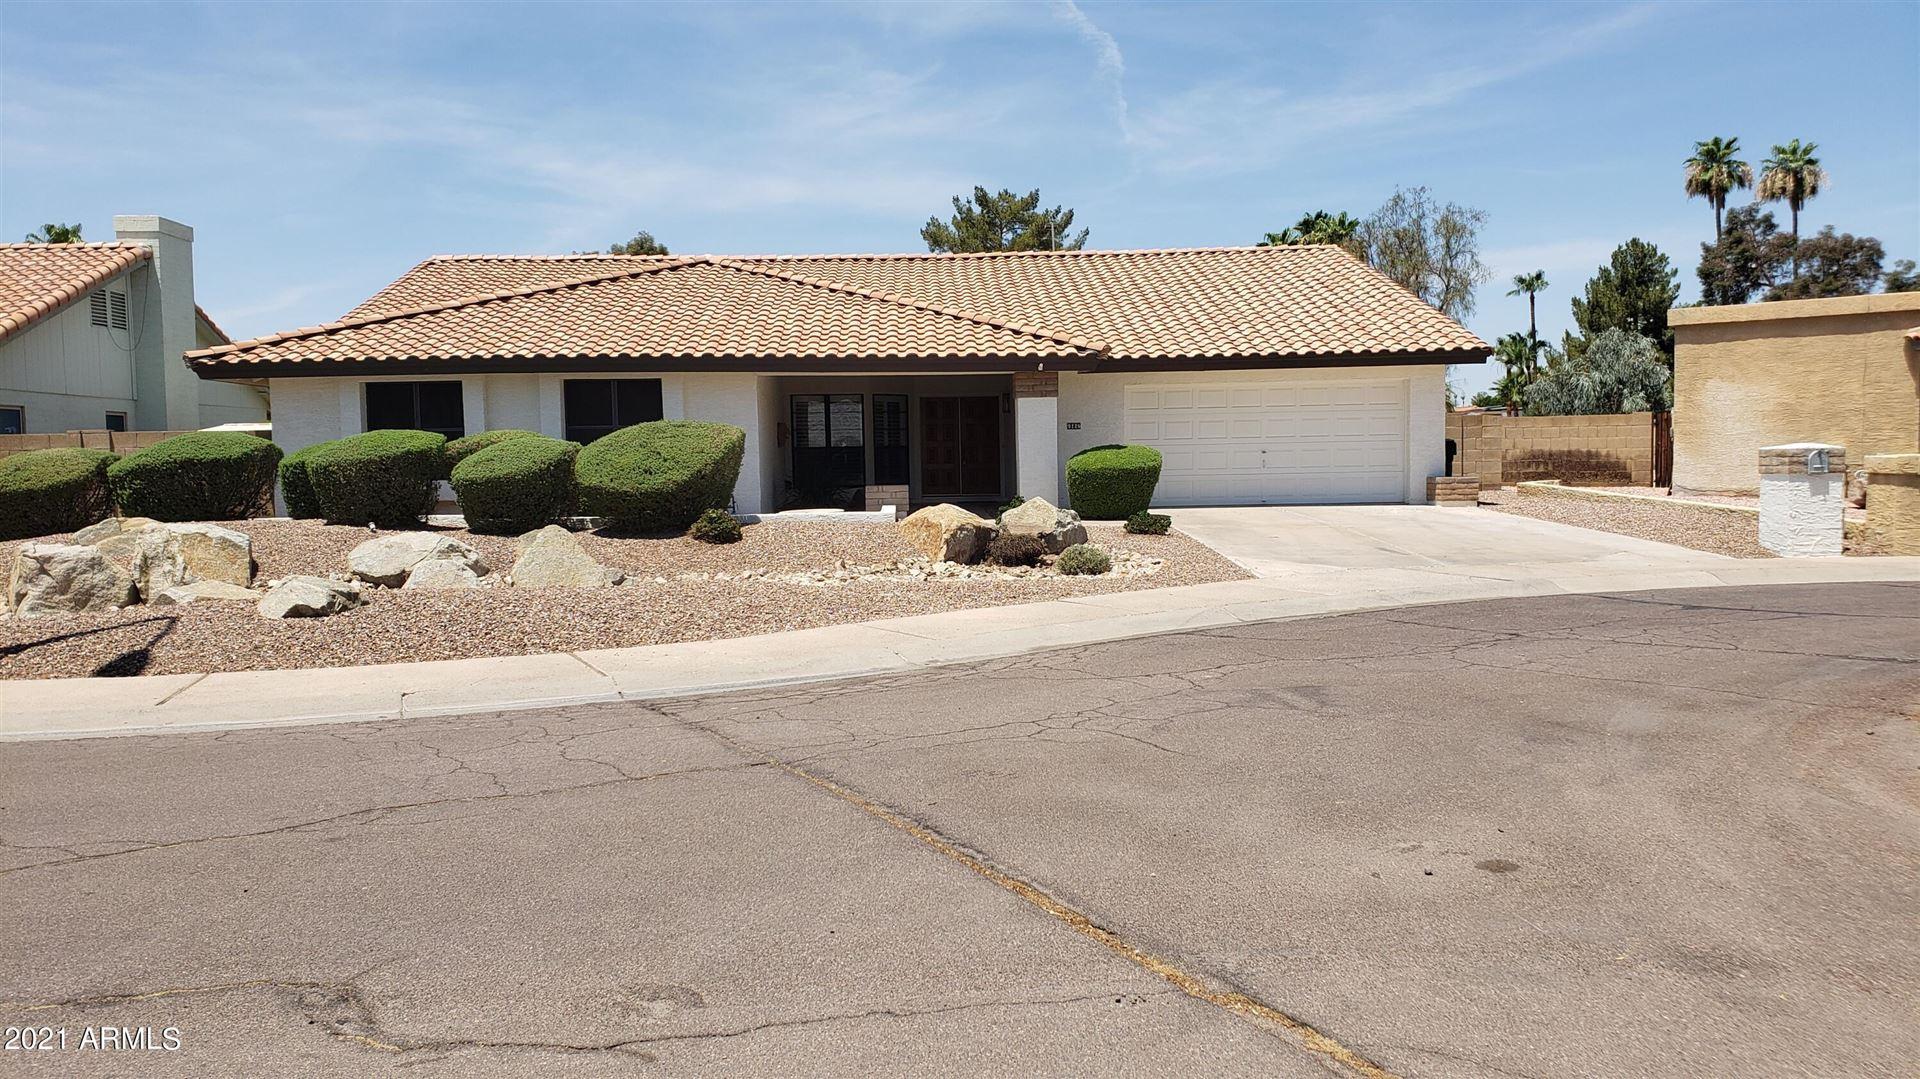 Photo of 9126 S HEATHER Drive, Tempe, AZ 85284 (MLS # 6261132)